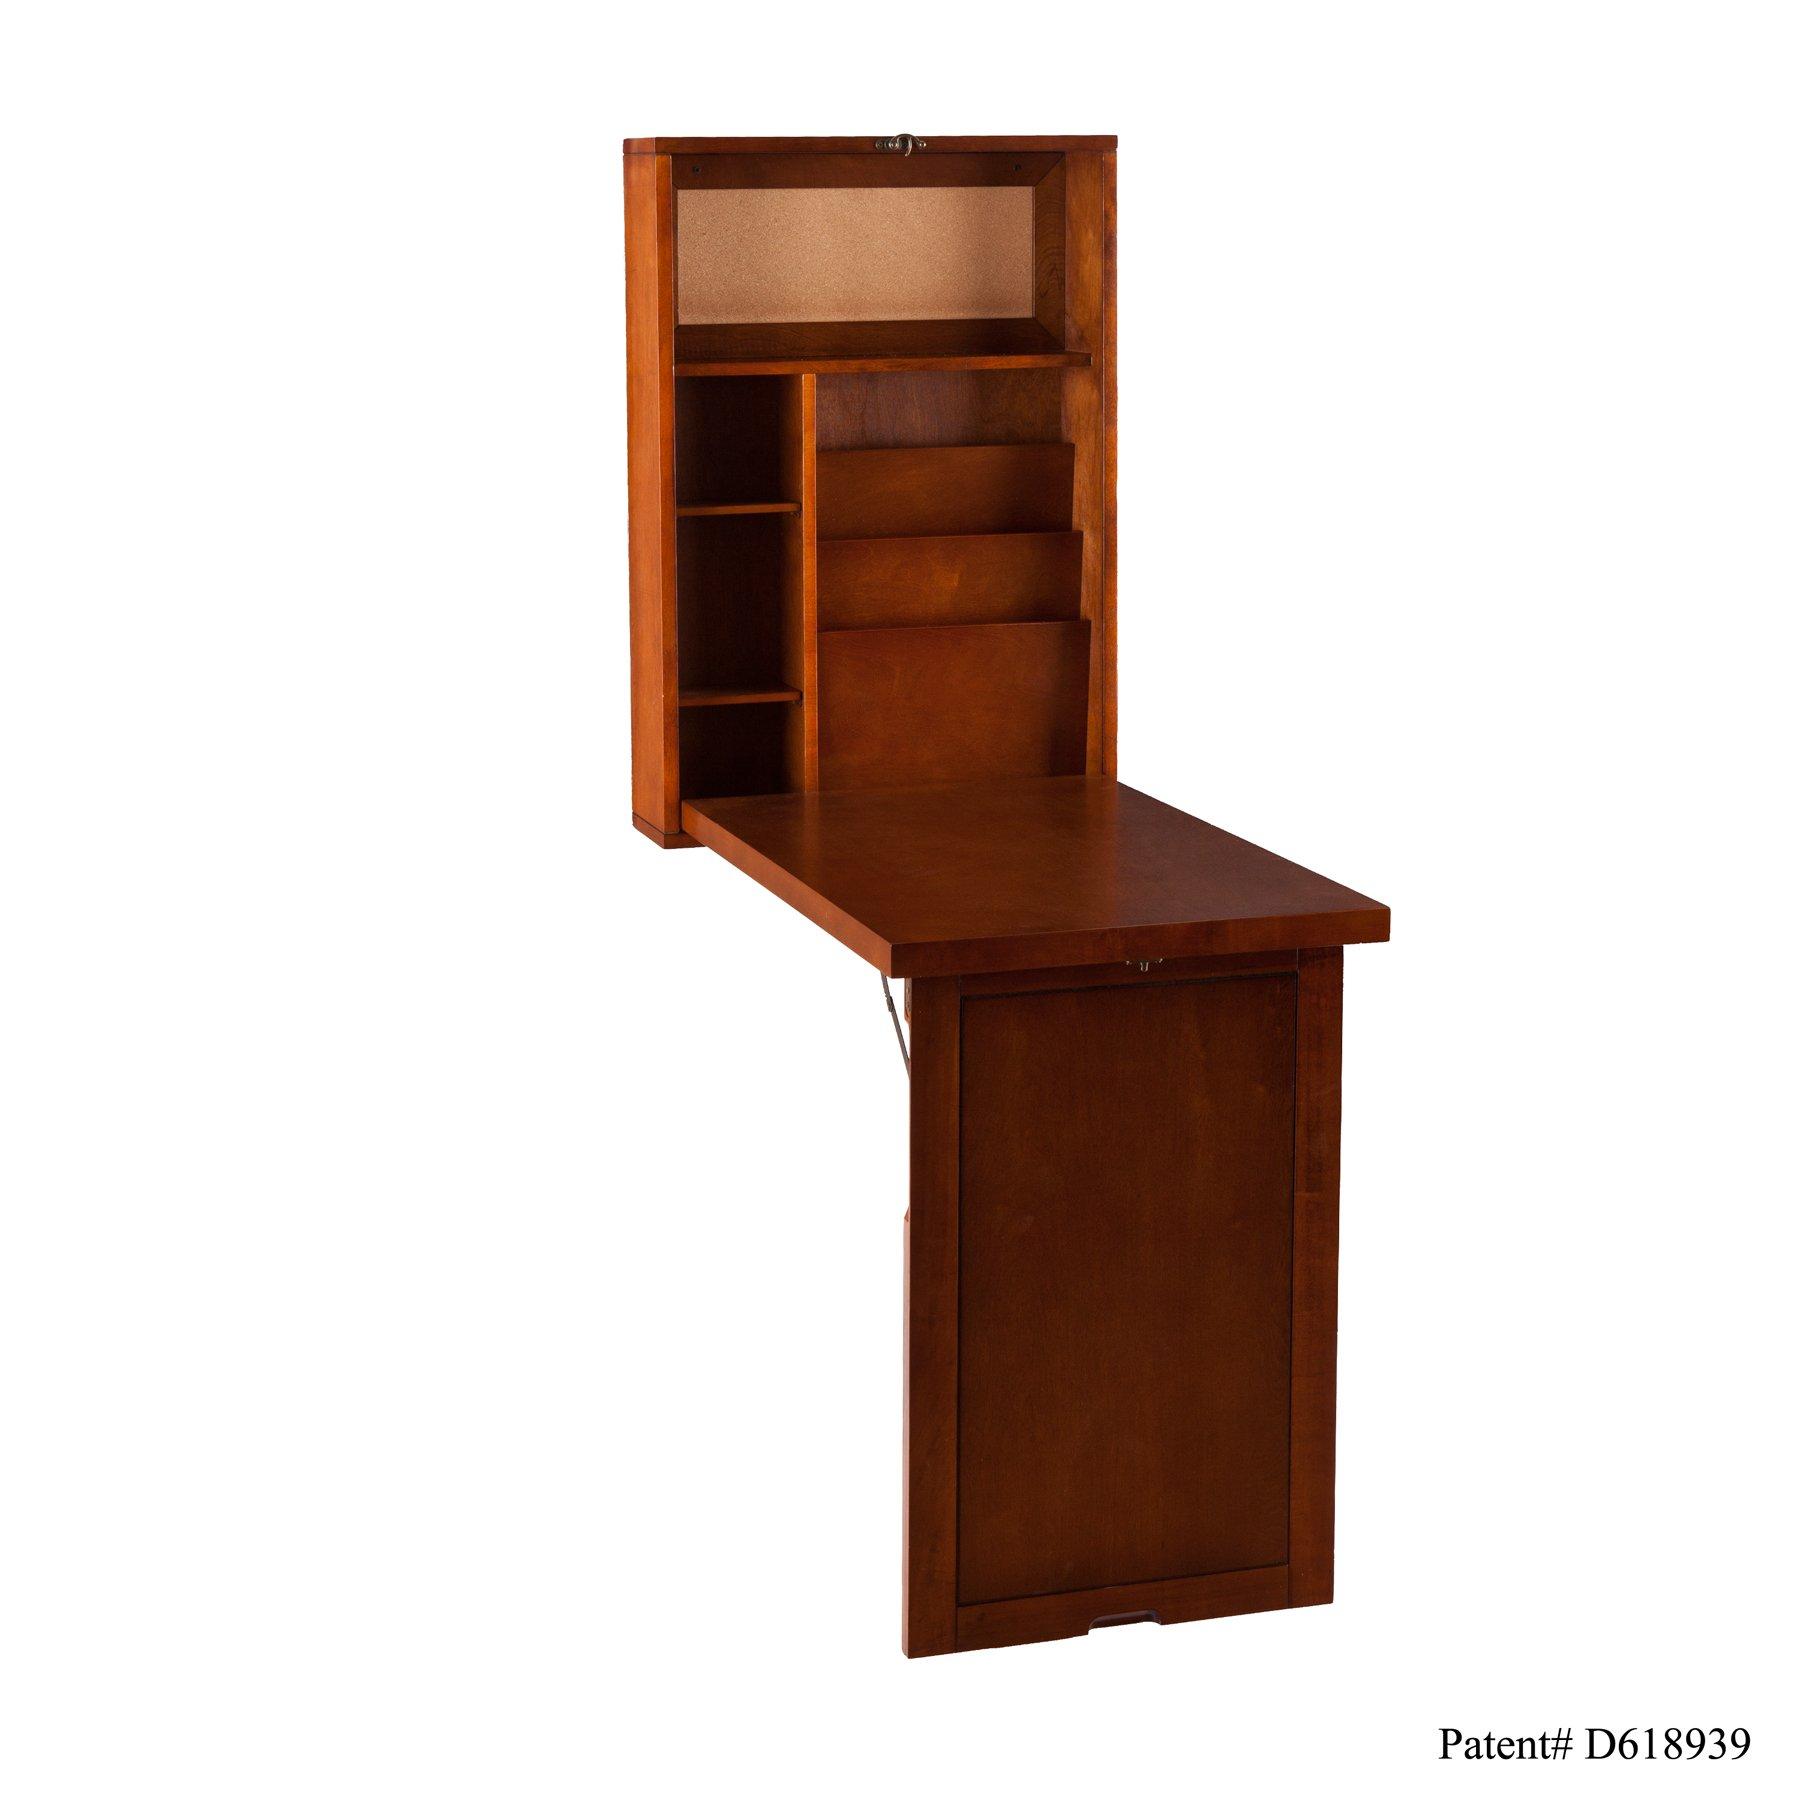 Southern Enterprises Fold-Out Convertible Desk 22'' Wide, Walnut Finish